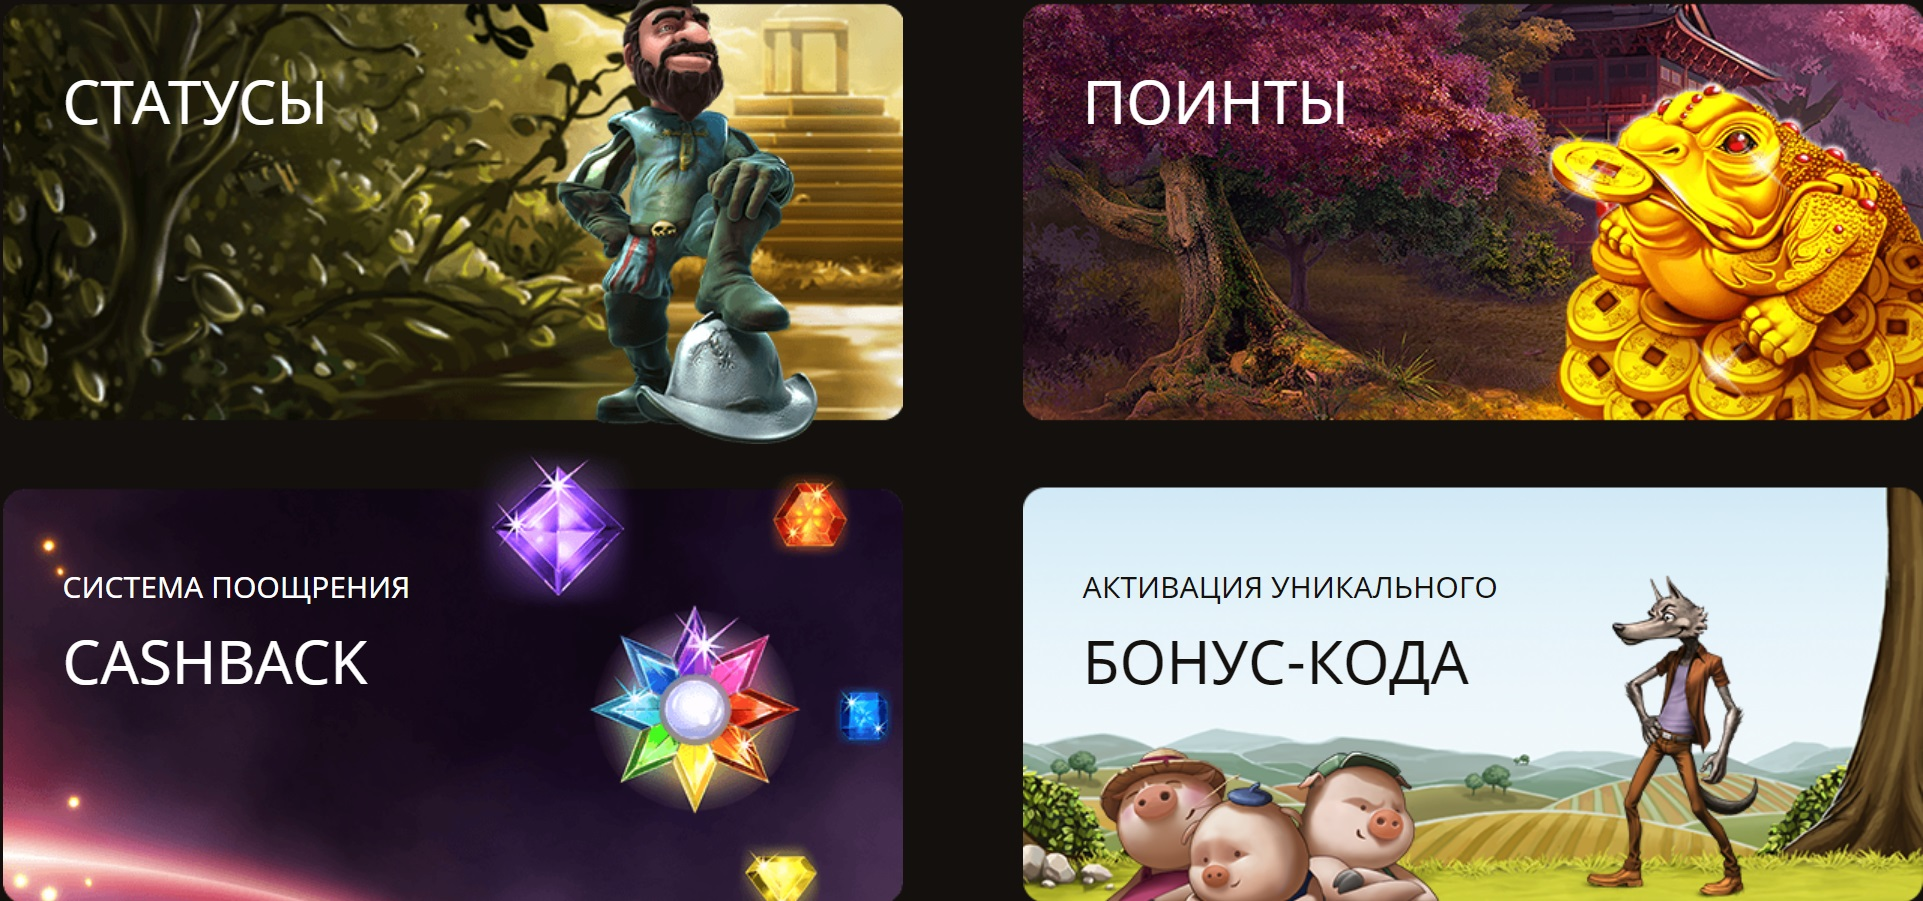 play fortuna промокод на июнь 2018